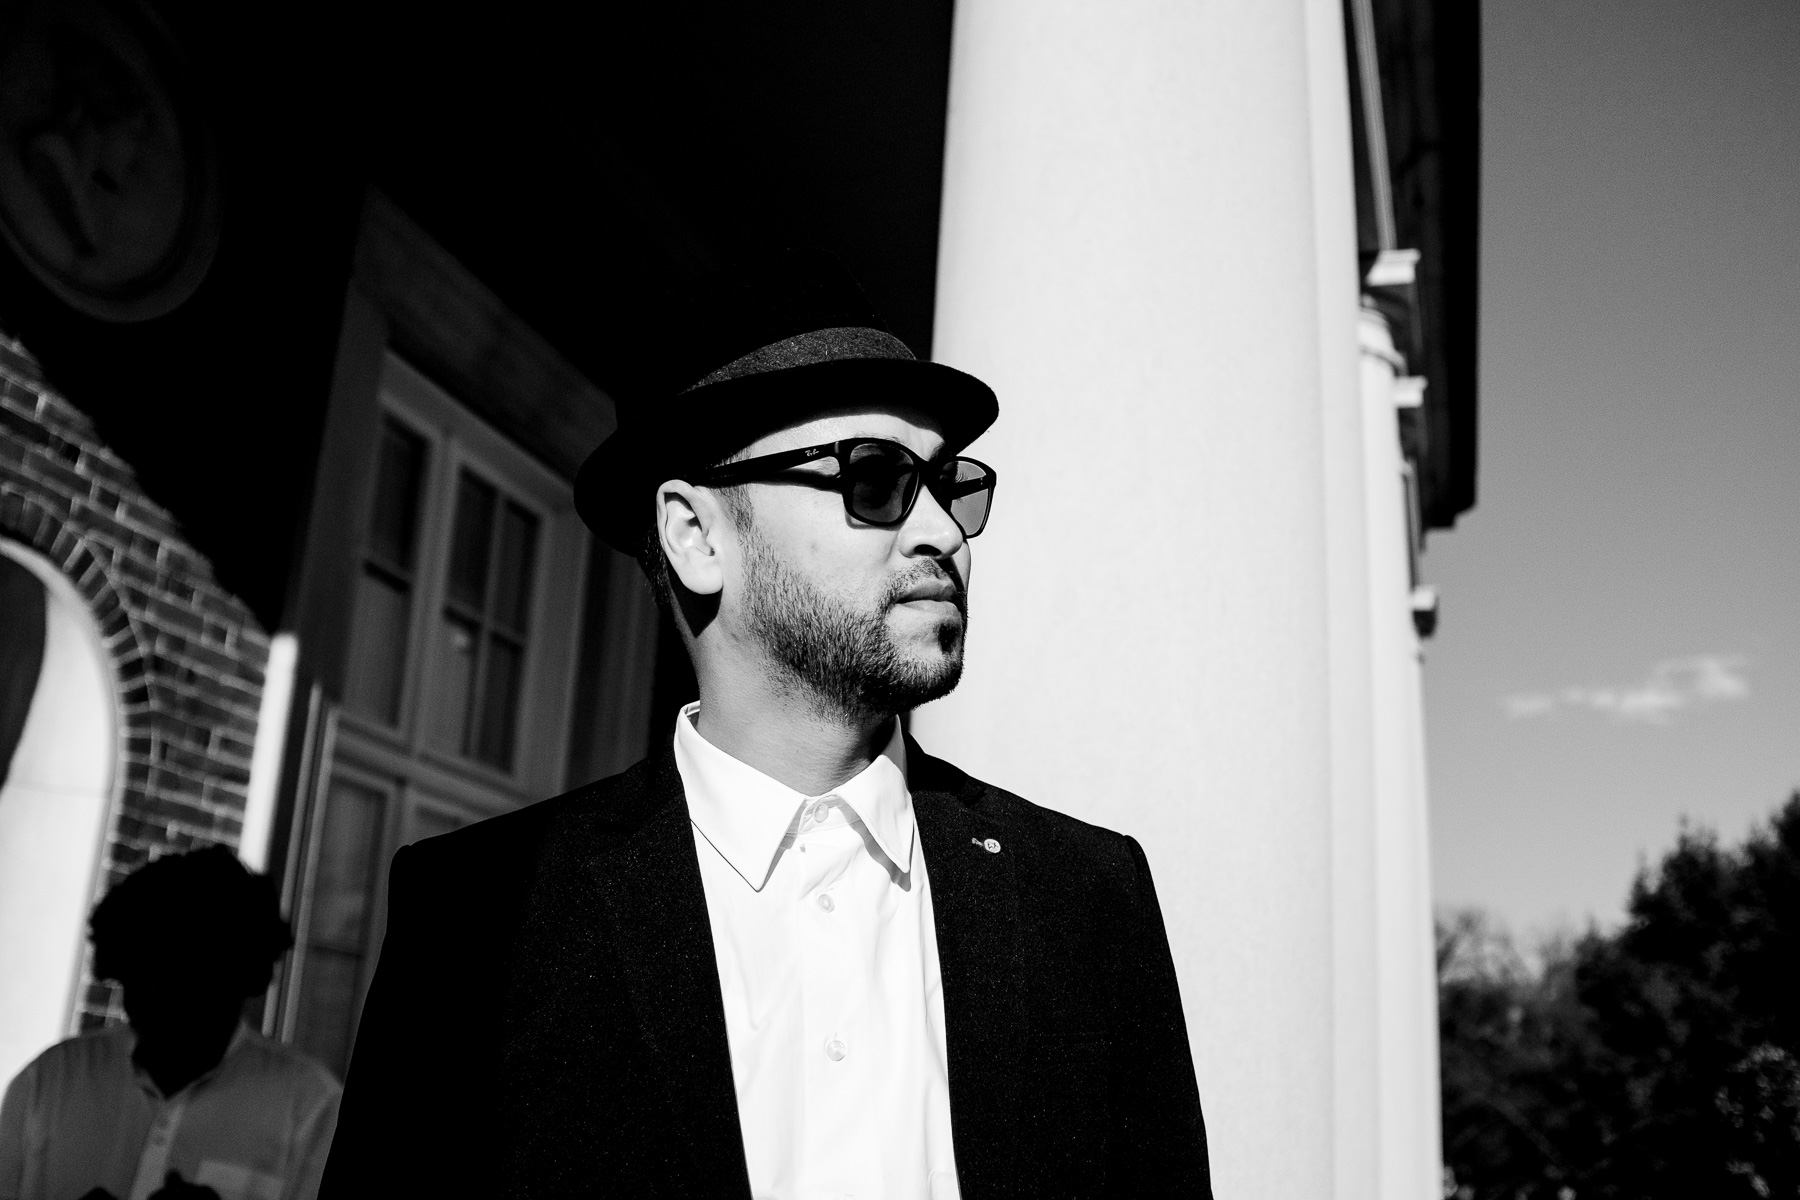 Abdelkarim Medouri aka Karim El Gang, Algerian rapper (Washington, USA, 2018)